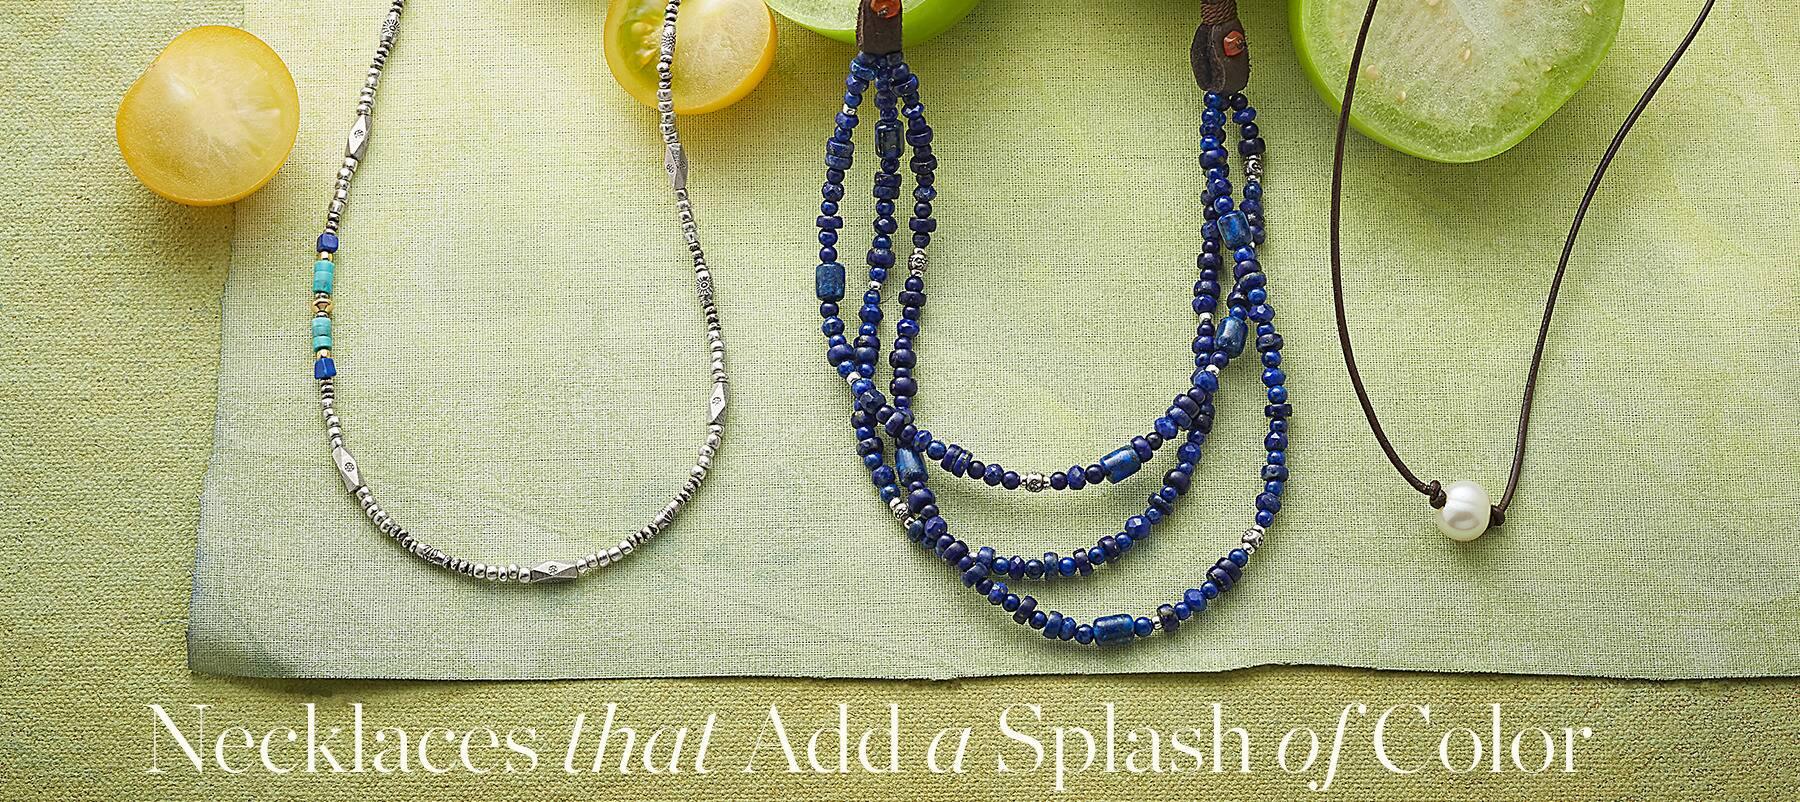 85ae54bdde Handmade Necklaces | Robert Redford's Sundance Catalog